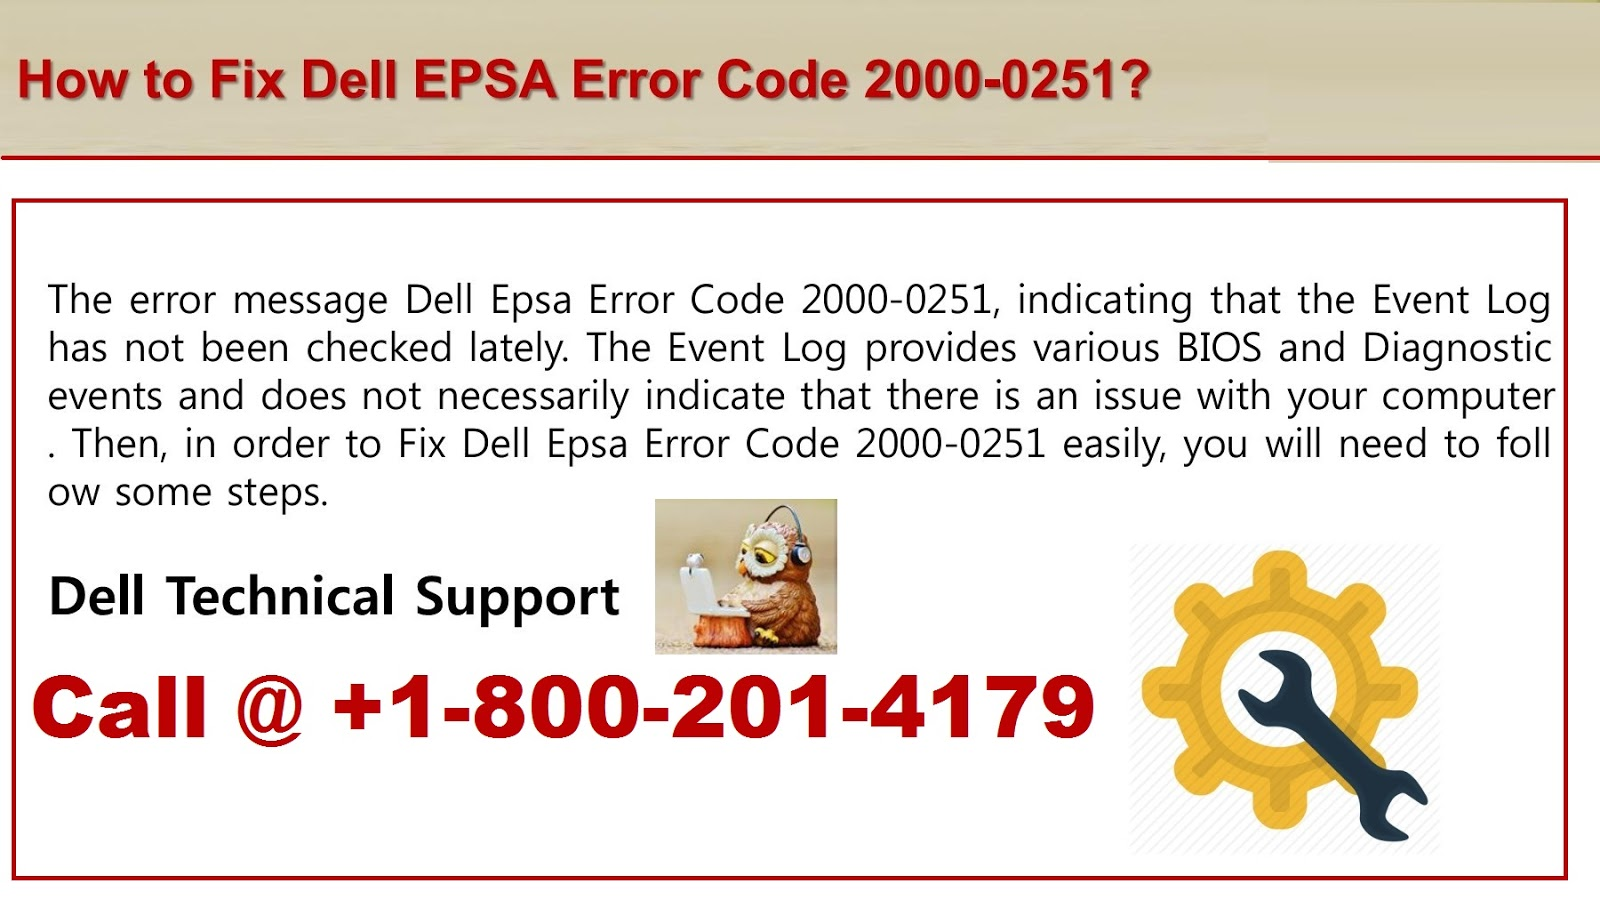 How to Fix Dell Error Code 2000-0125?